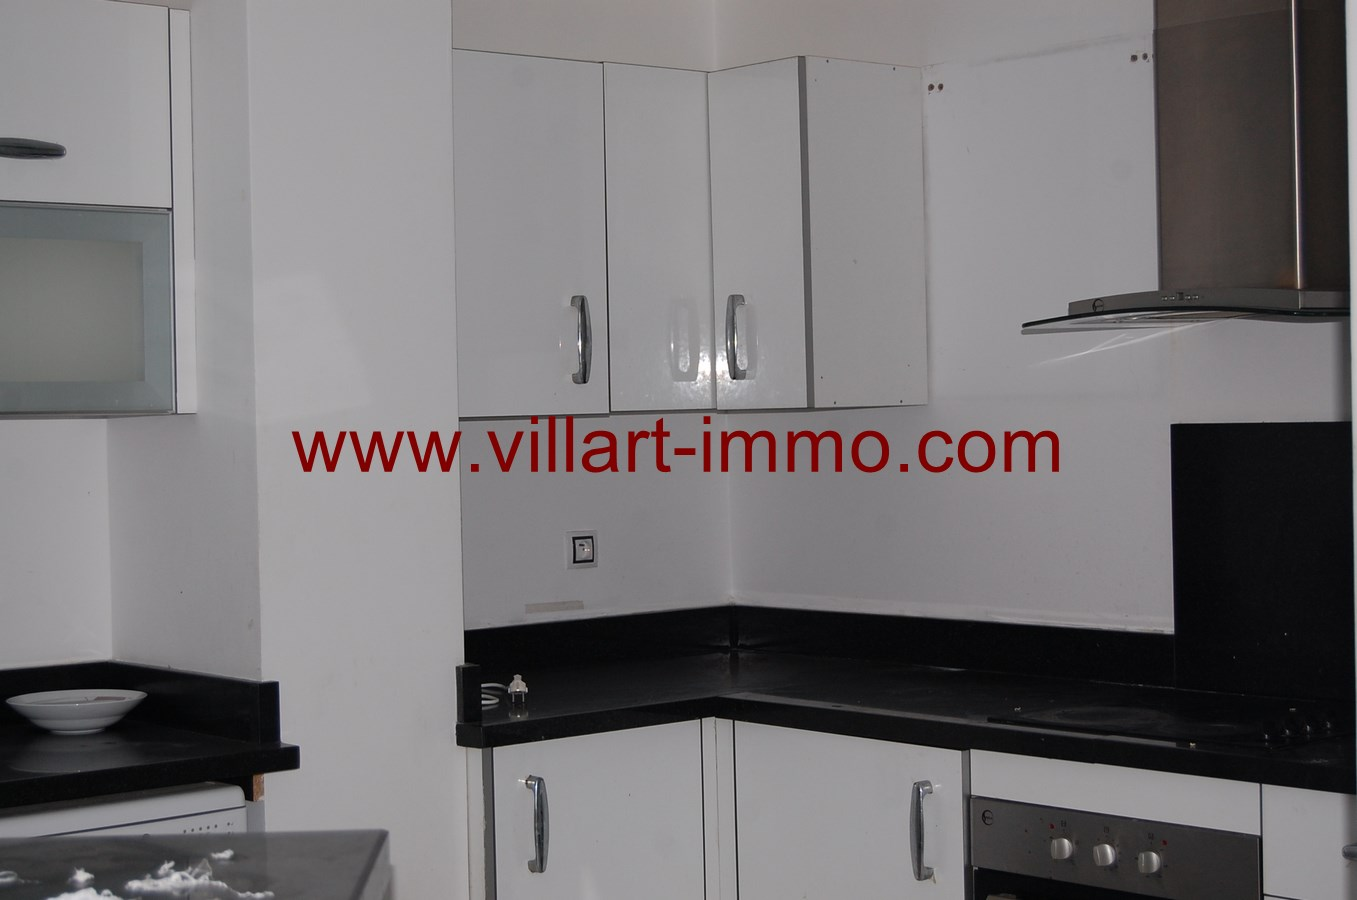 3-a-vendre-appartement-tanger-quartier-playa-cuisine-va433-villart-immo